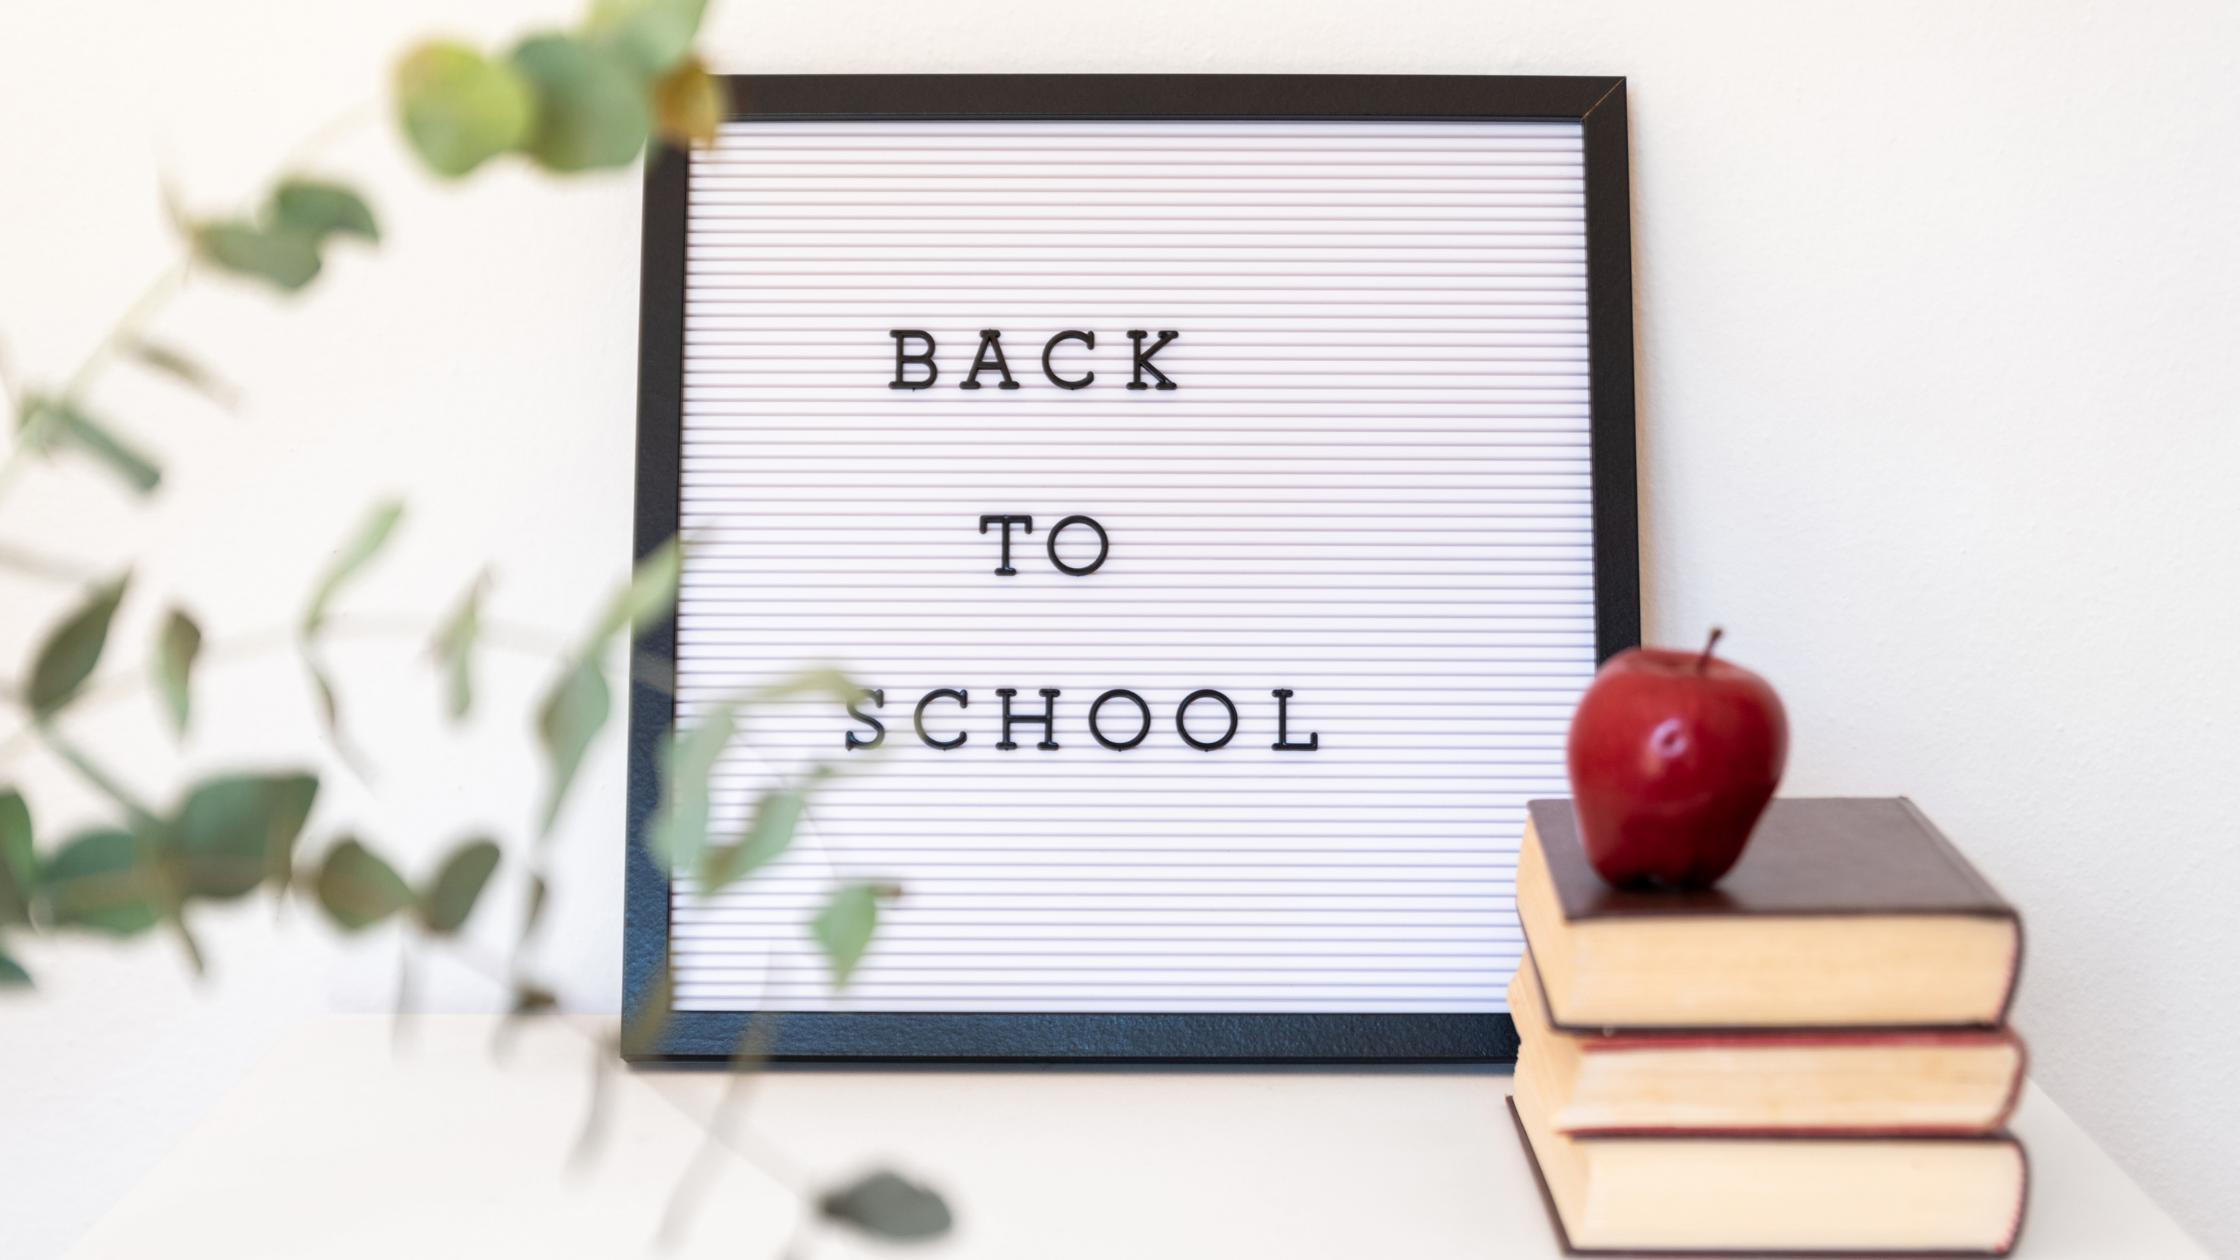 Kinsalebeg NS Back to School August 2021